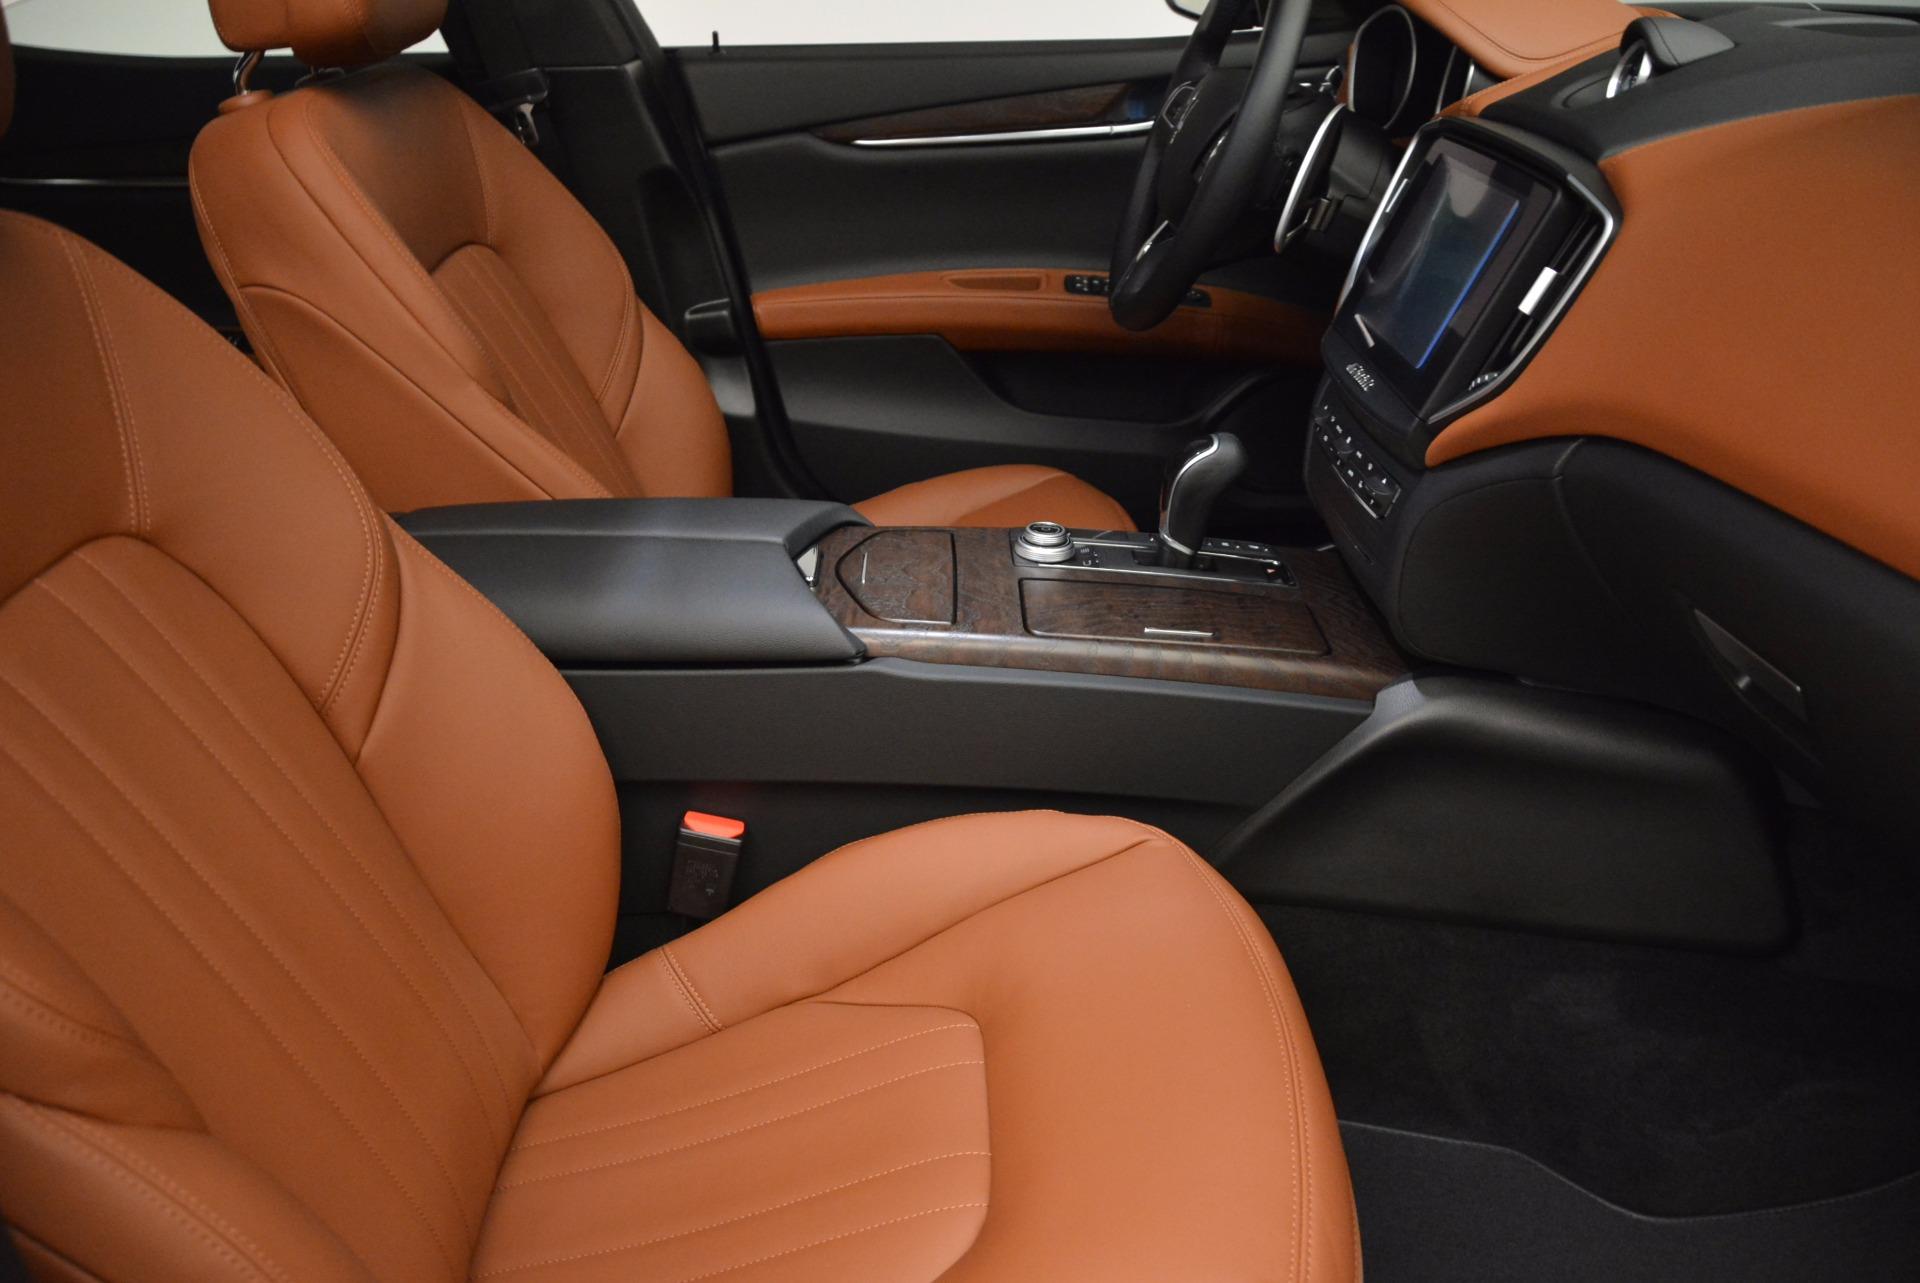 Used 2017 Maserati Ghibli S Q4 Ex-Loaner For Sale In Greenwich, CT 1165_p16